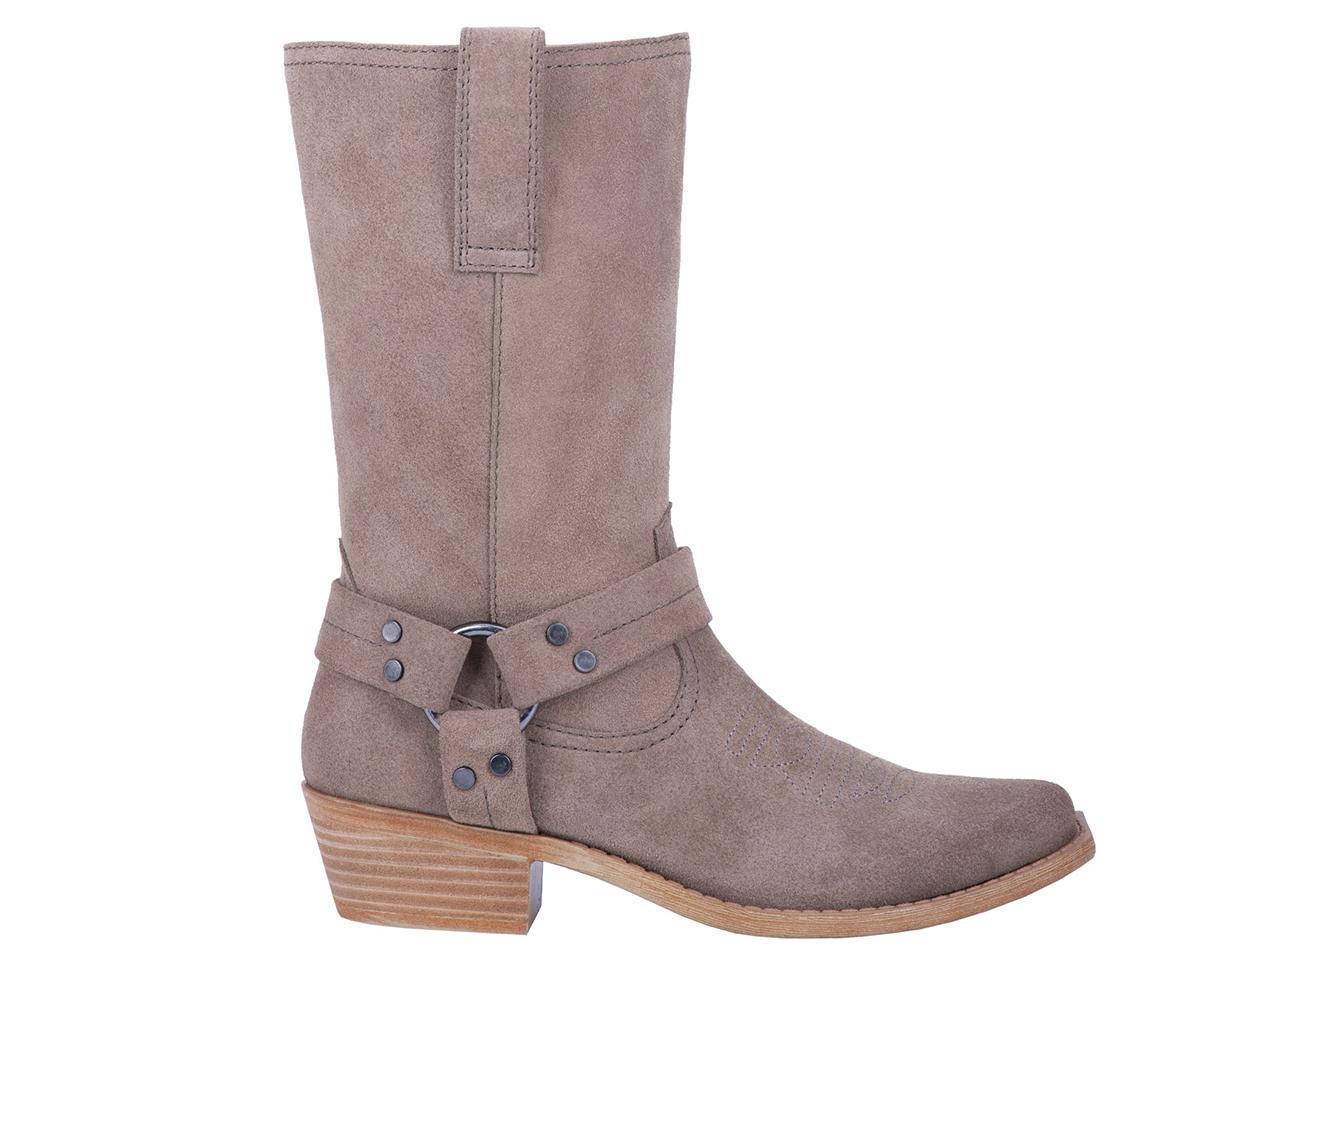 Dingo Boots Dingo Women's Boots (Brown - Leather)